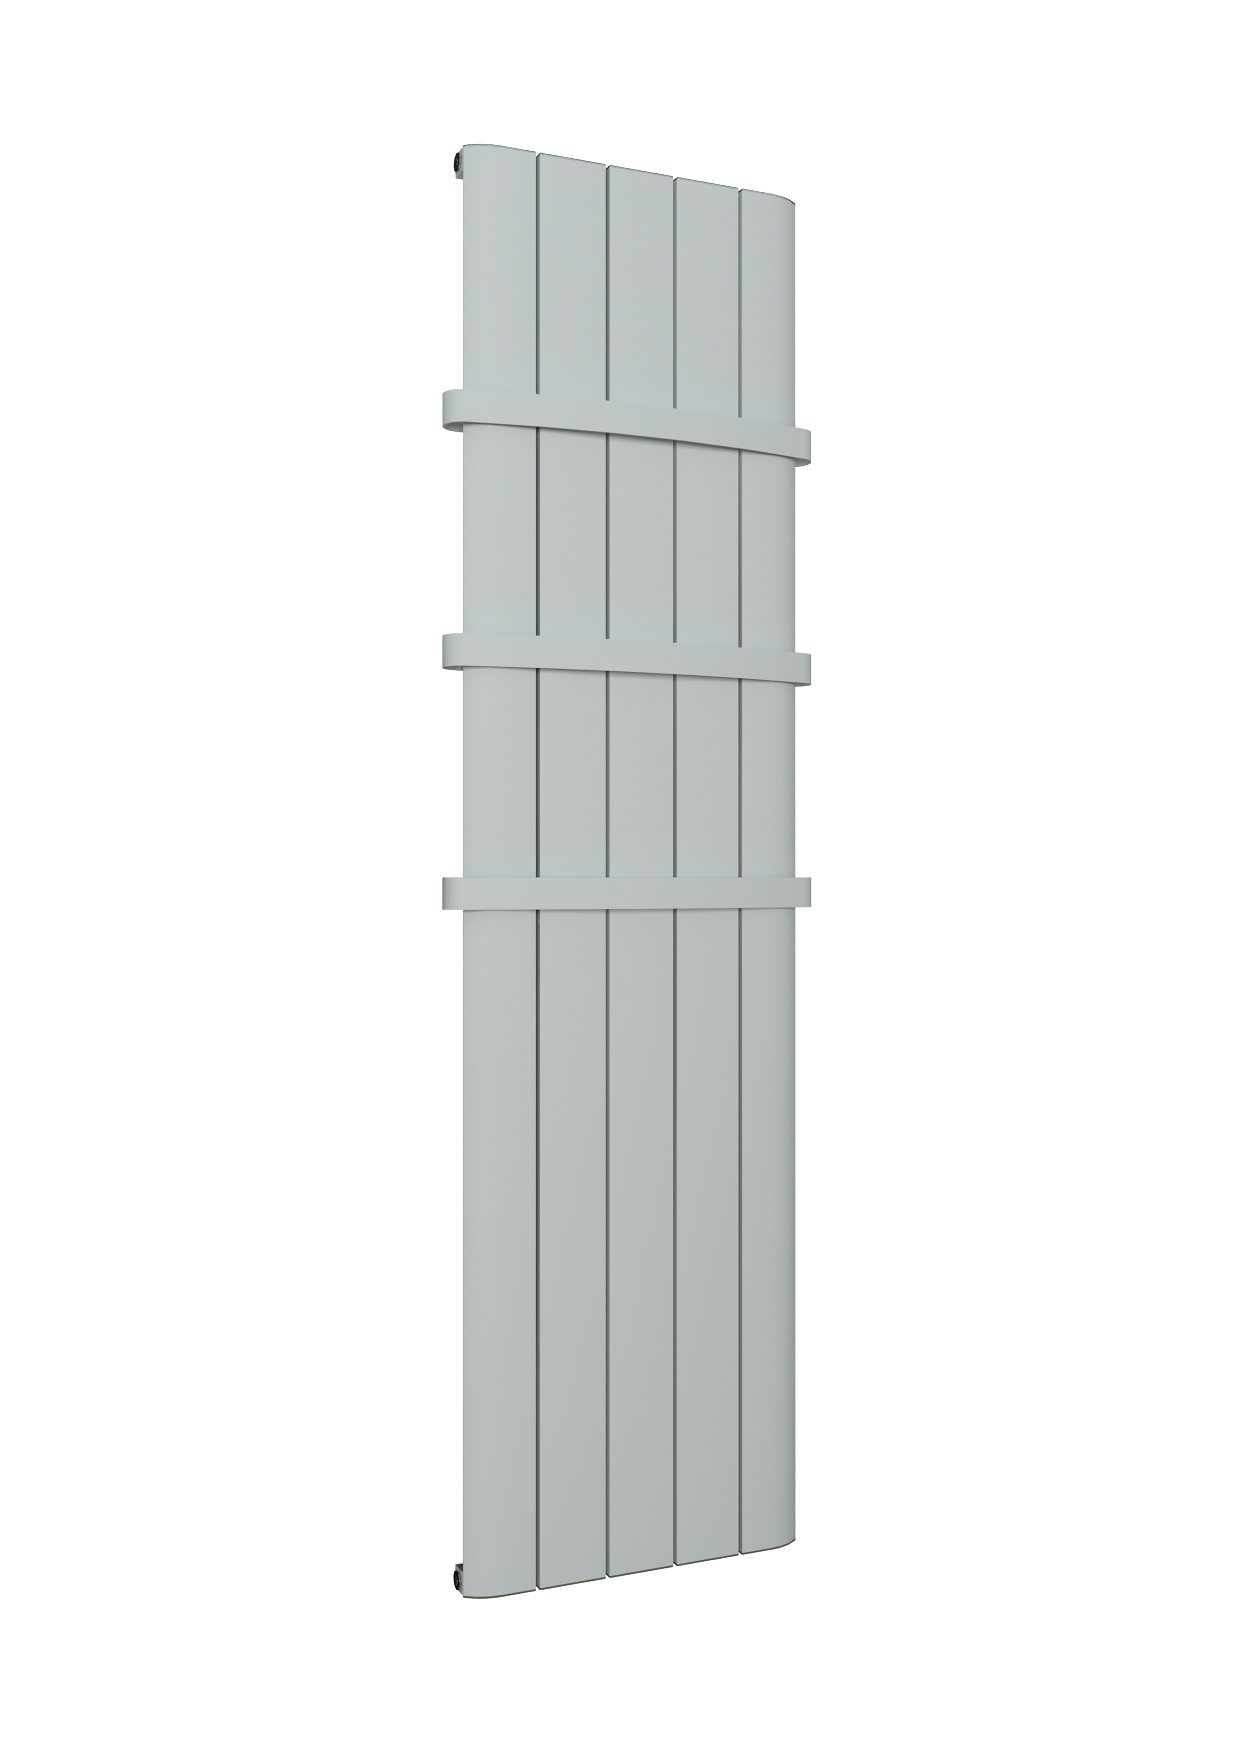 Eastbrook Withington verticale aluminium radiator 180x47cm Mat wit 1415 watt